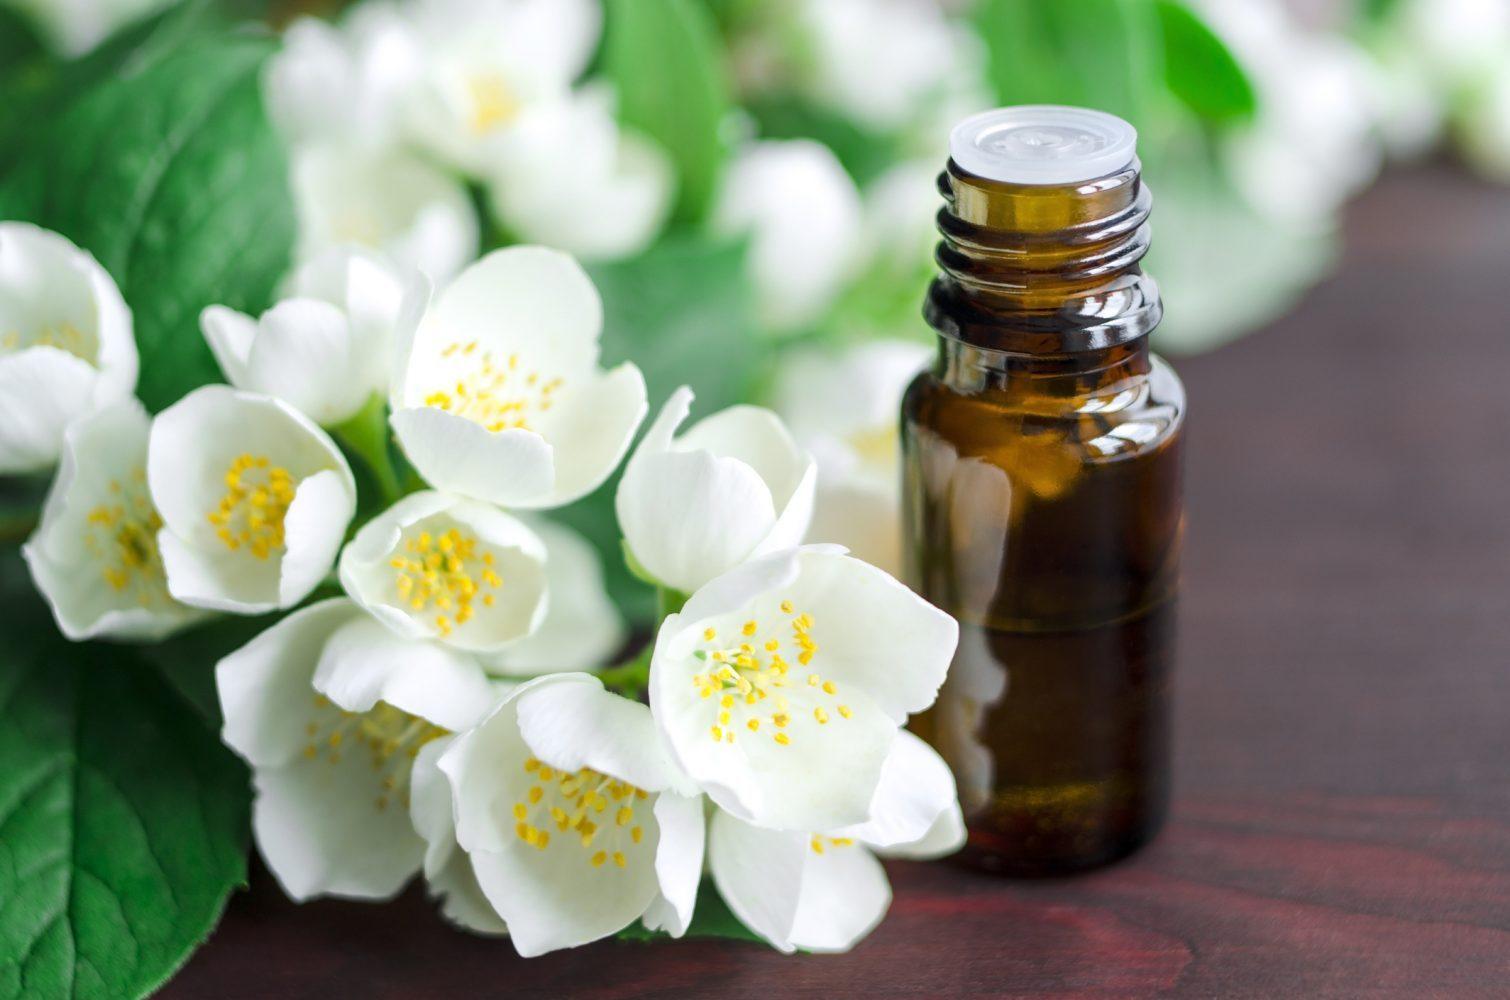 aroma a jazmín